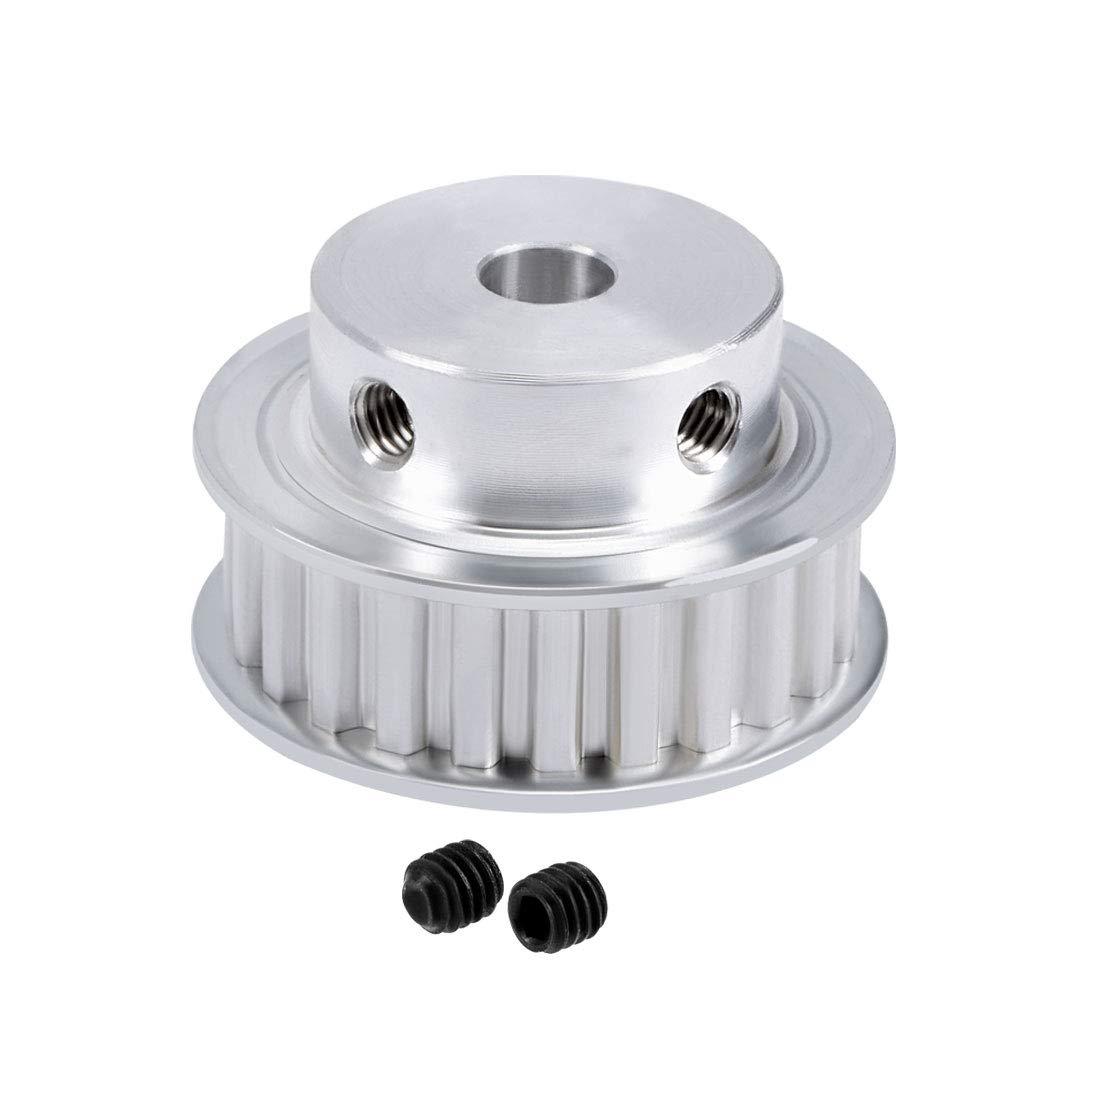 sourcing map 2pcs Aluminum XL 20 Teeth 10mm Bore Timing Belt Pulley Flange Synchronous Wheel for 11mm Belt 3D Printer CNC